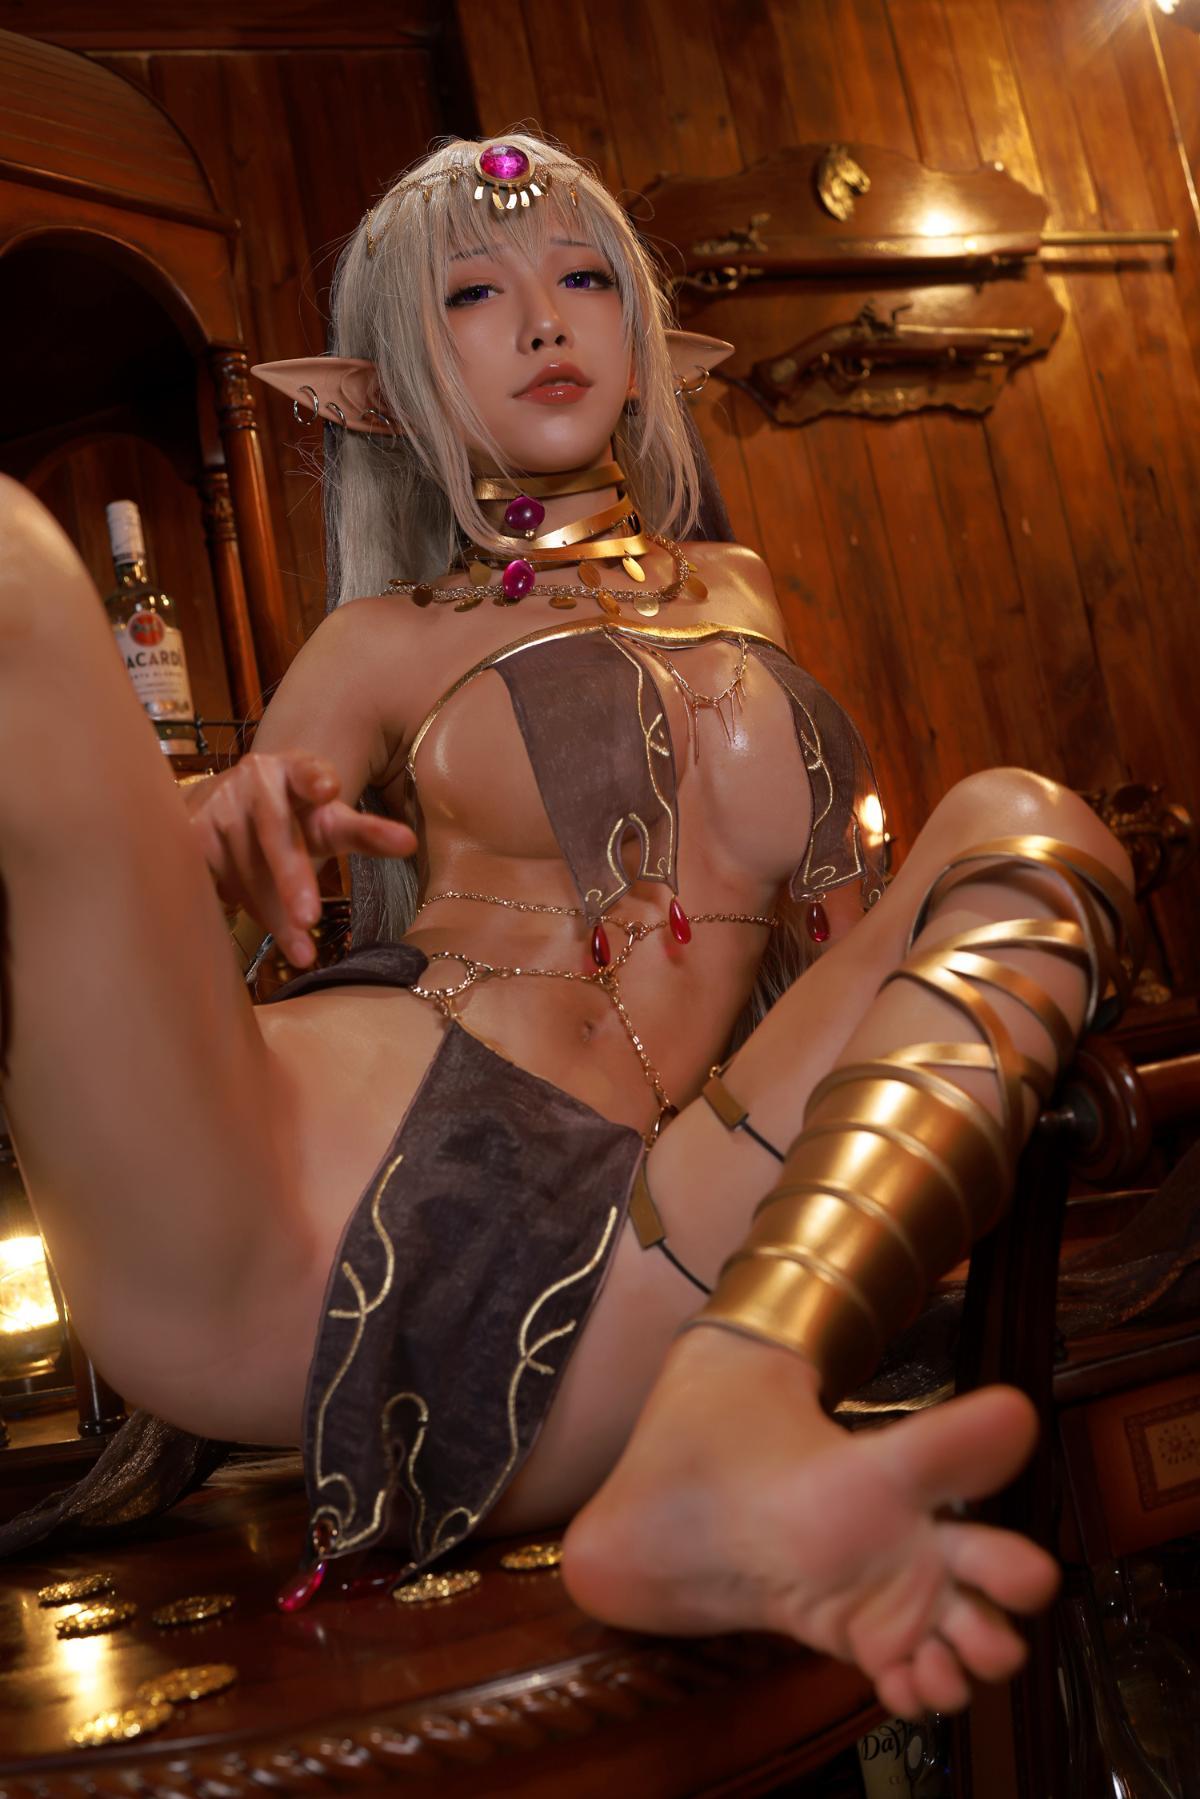 Tan Dancer Elf Succubus Cosplay by Aqua 32